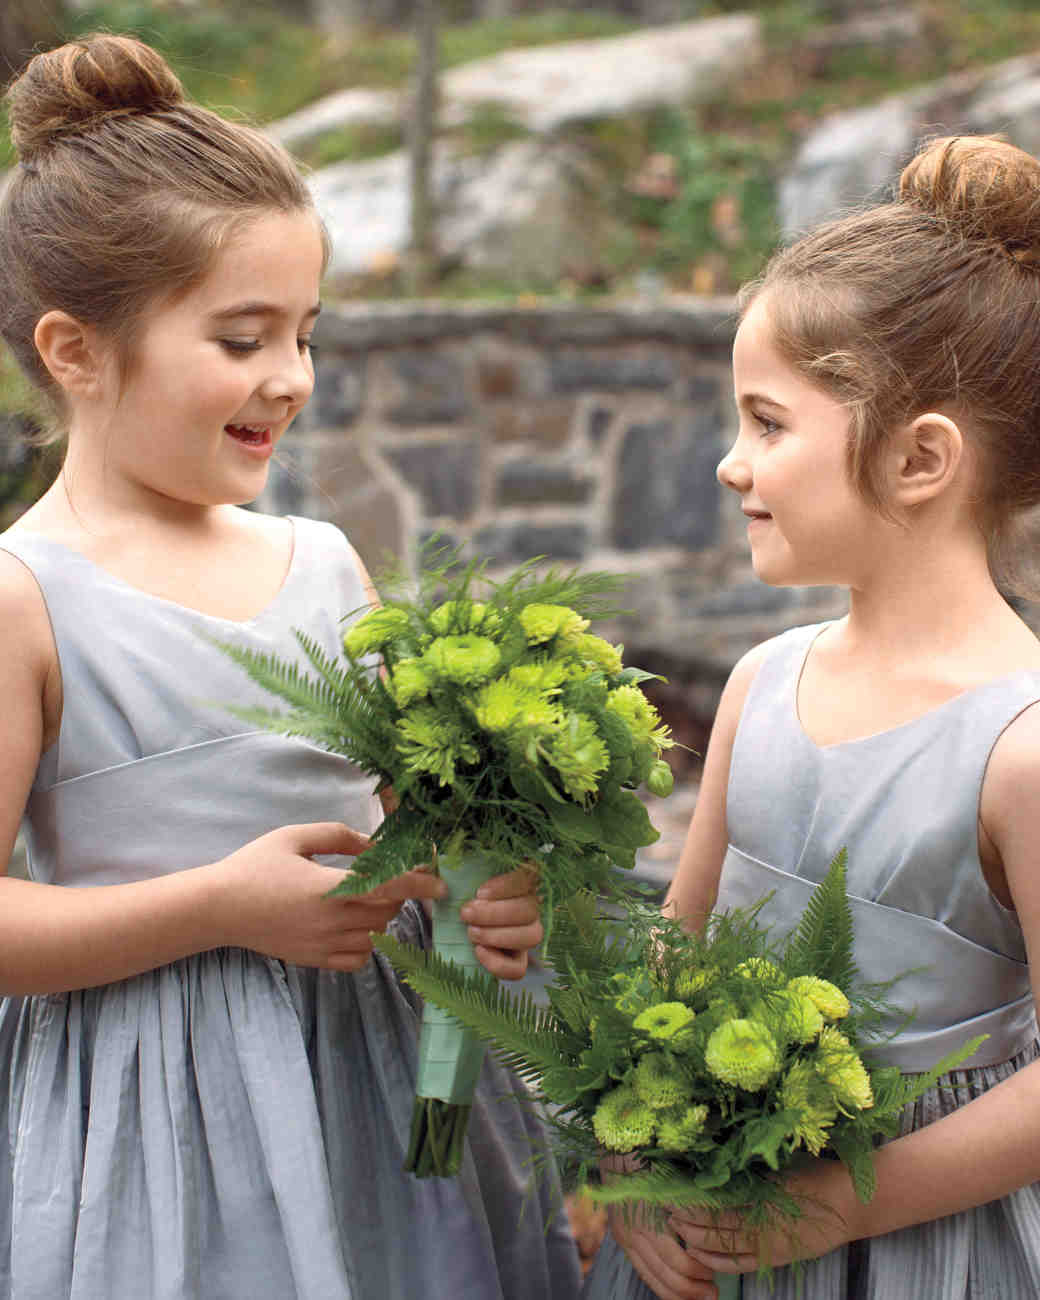 matthew-jack-flower-girls-0061-mwd109591.jpg